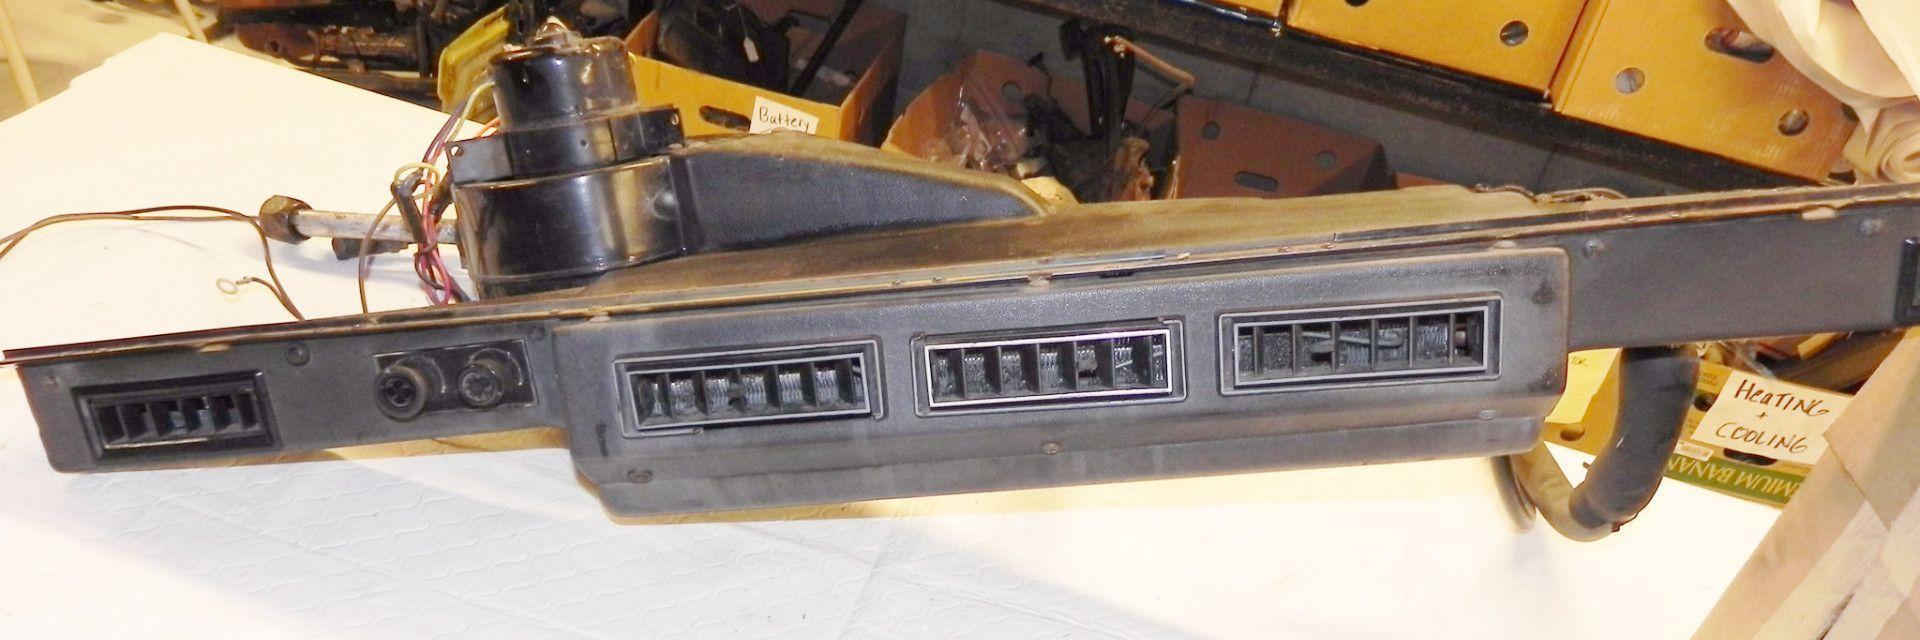 jeep wrangler yj a/c air conditioner under dash ac exchange unit